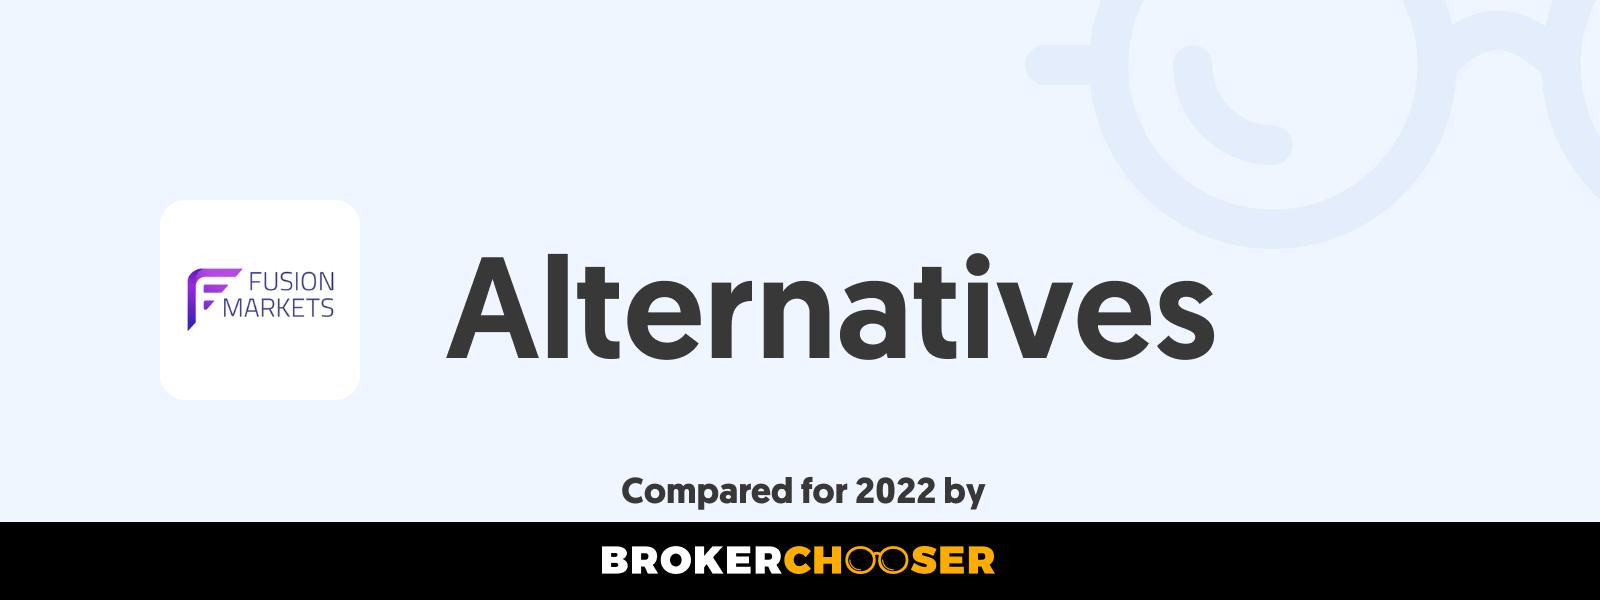 Fusion Markets Alternatives